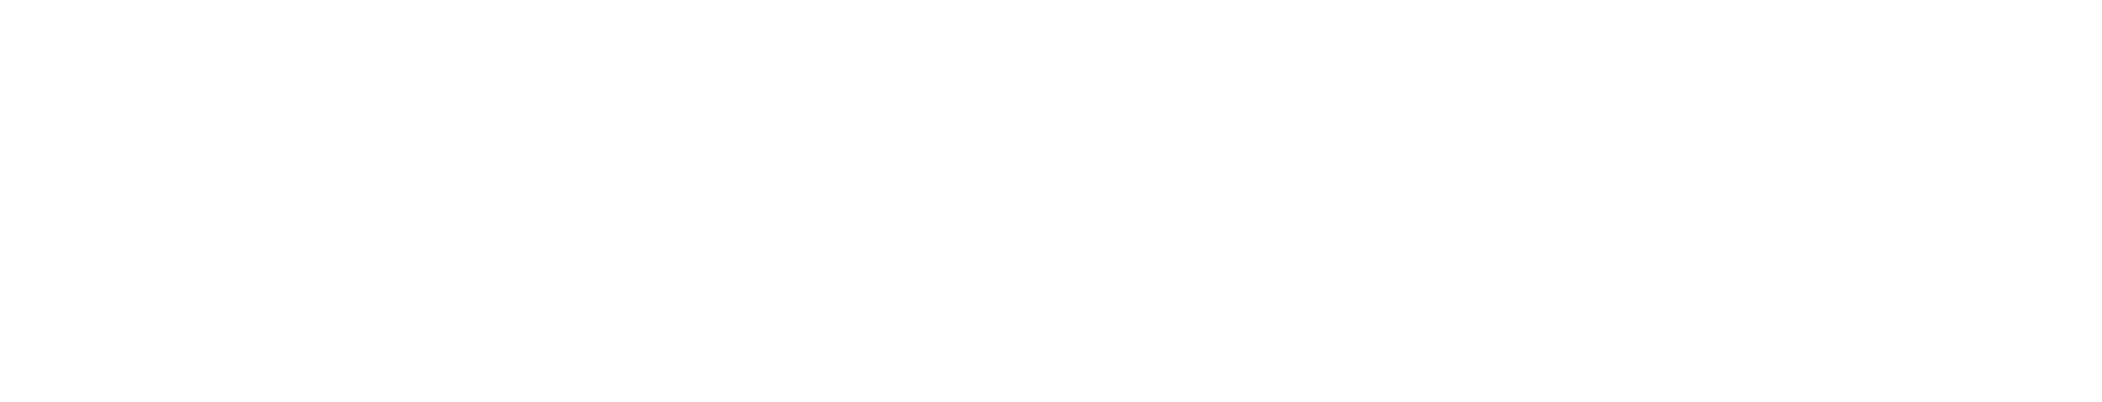 veille-techno-icone